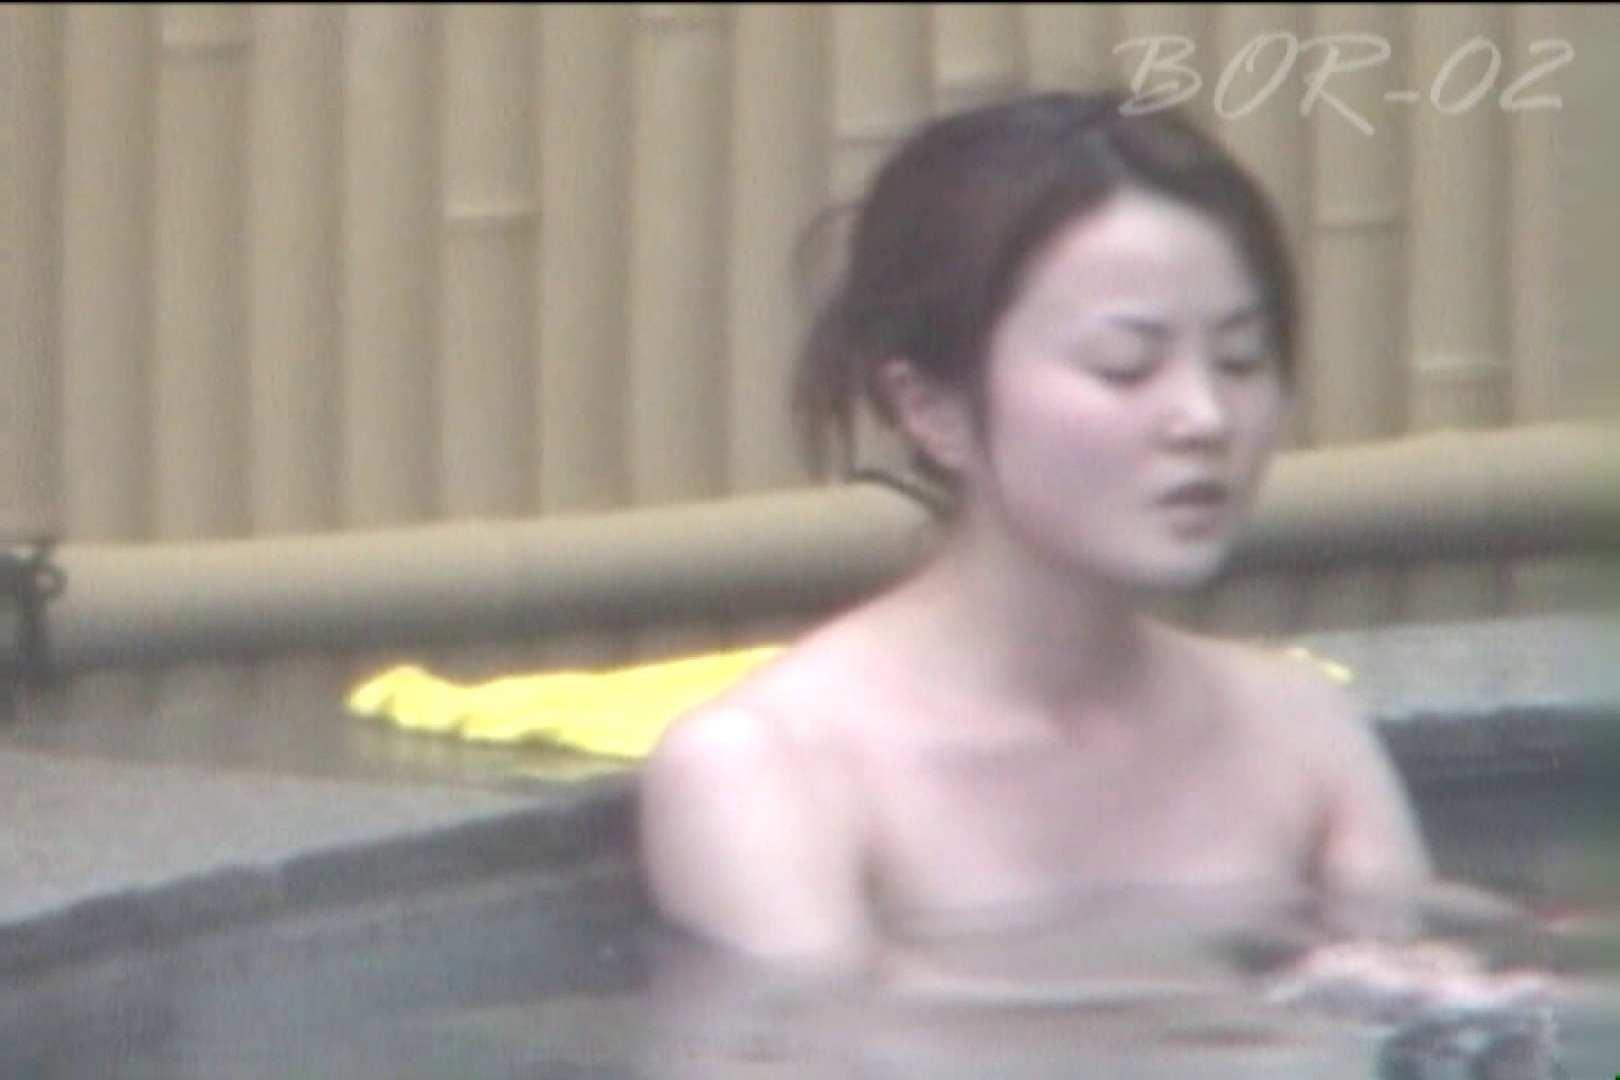 Aquaな露天風呂Vol.474 露天 AV動画キャプチャ 113pic 91